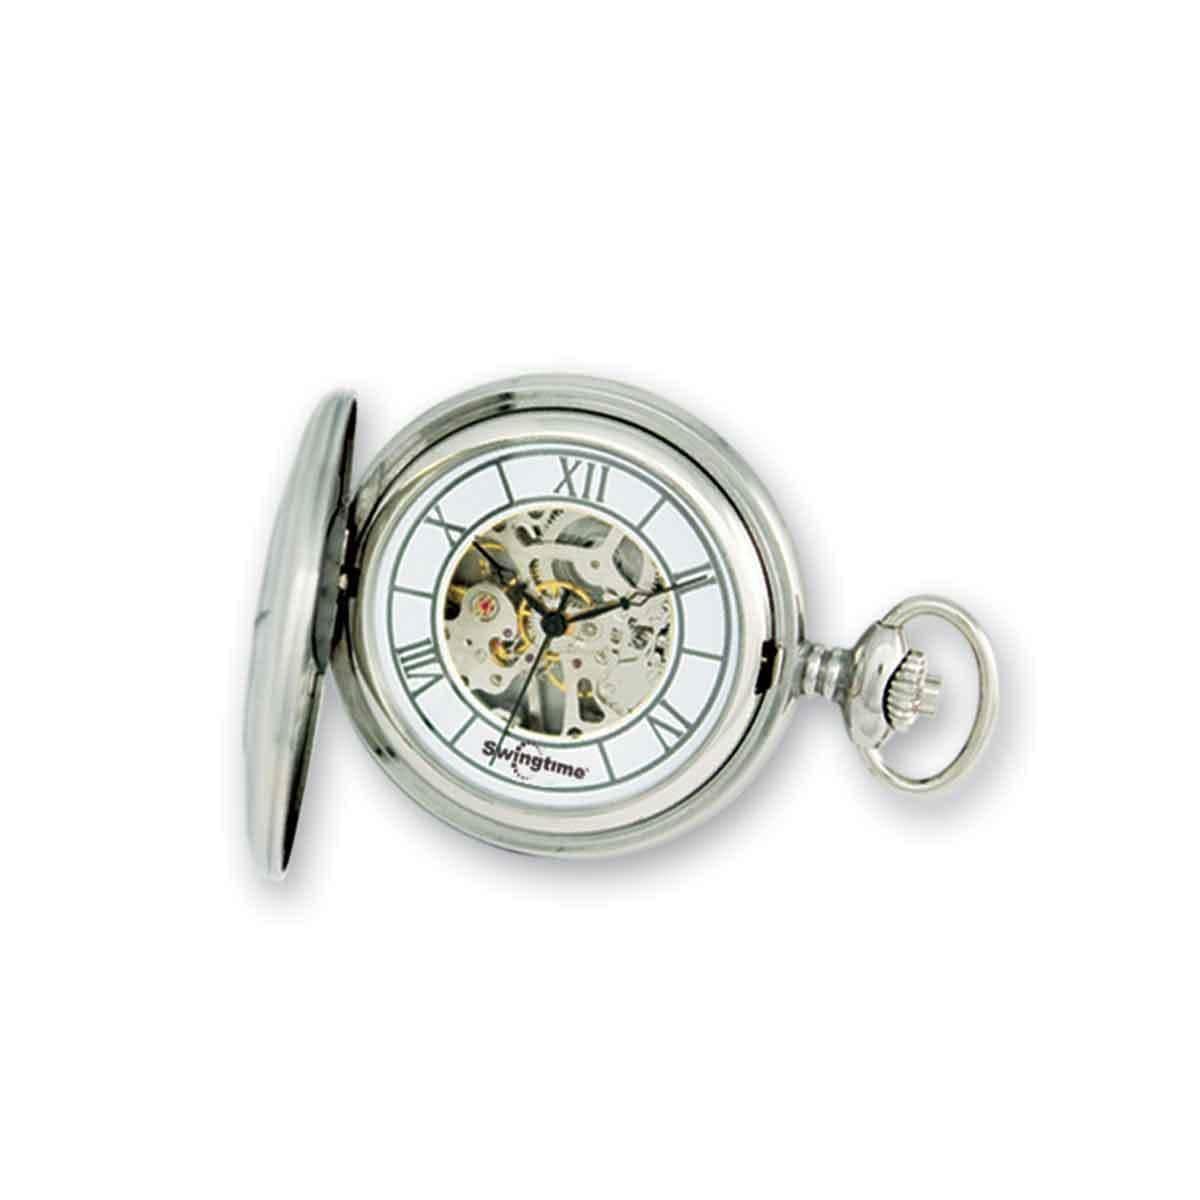 Versil Swingtime Stainless Steel Mechanical Pocket Watch ...